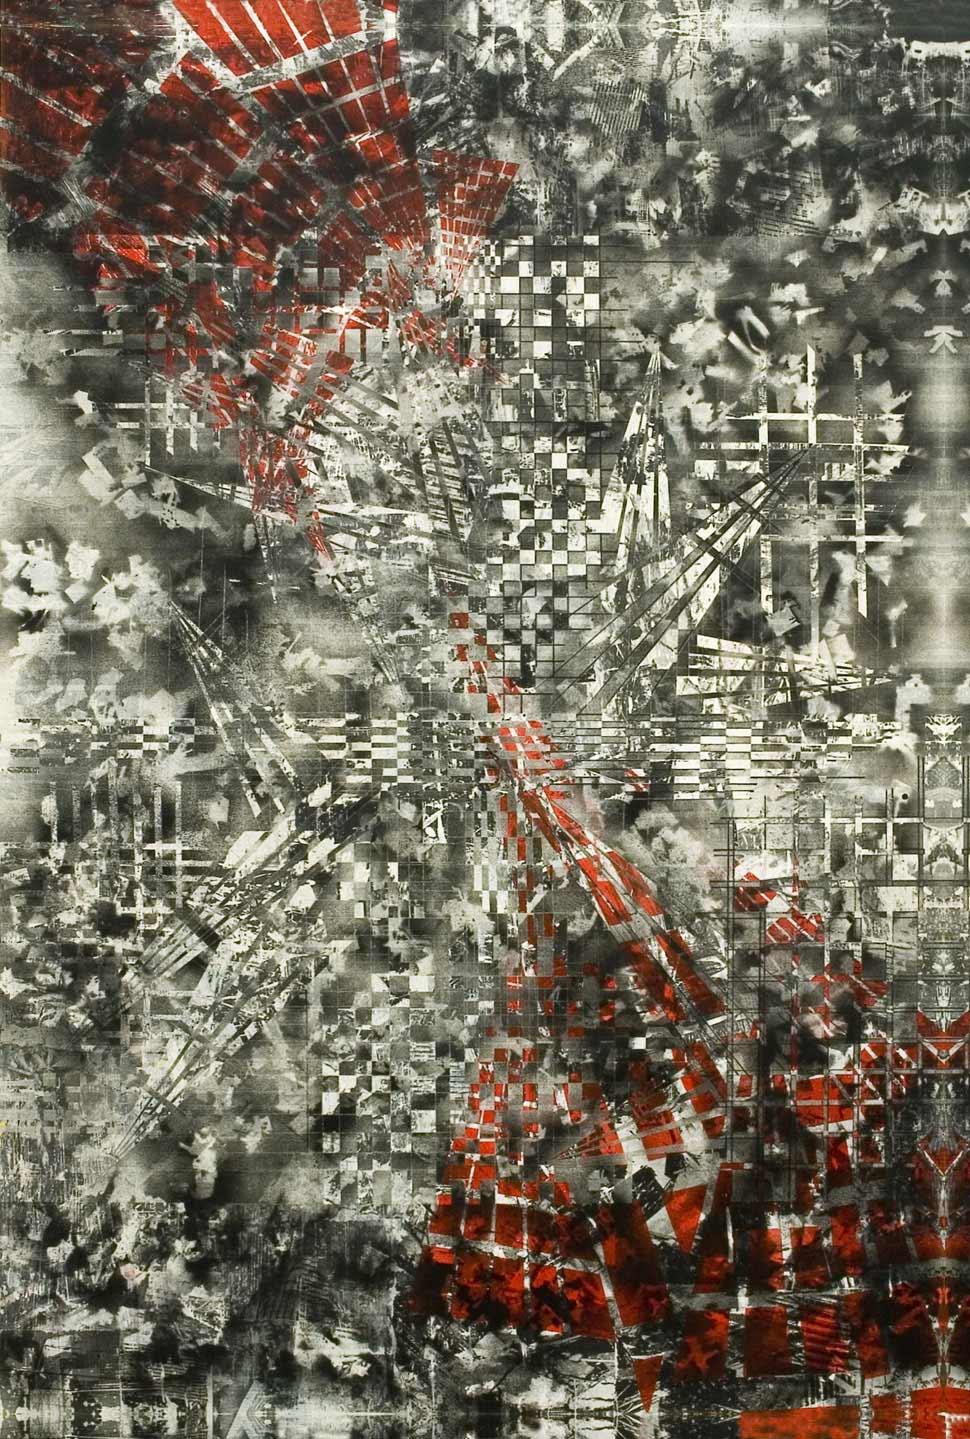 Carlo Allarde - Chaos and Order